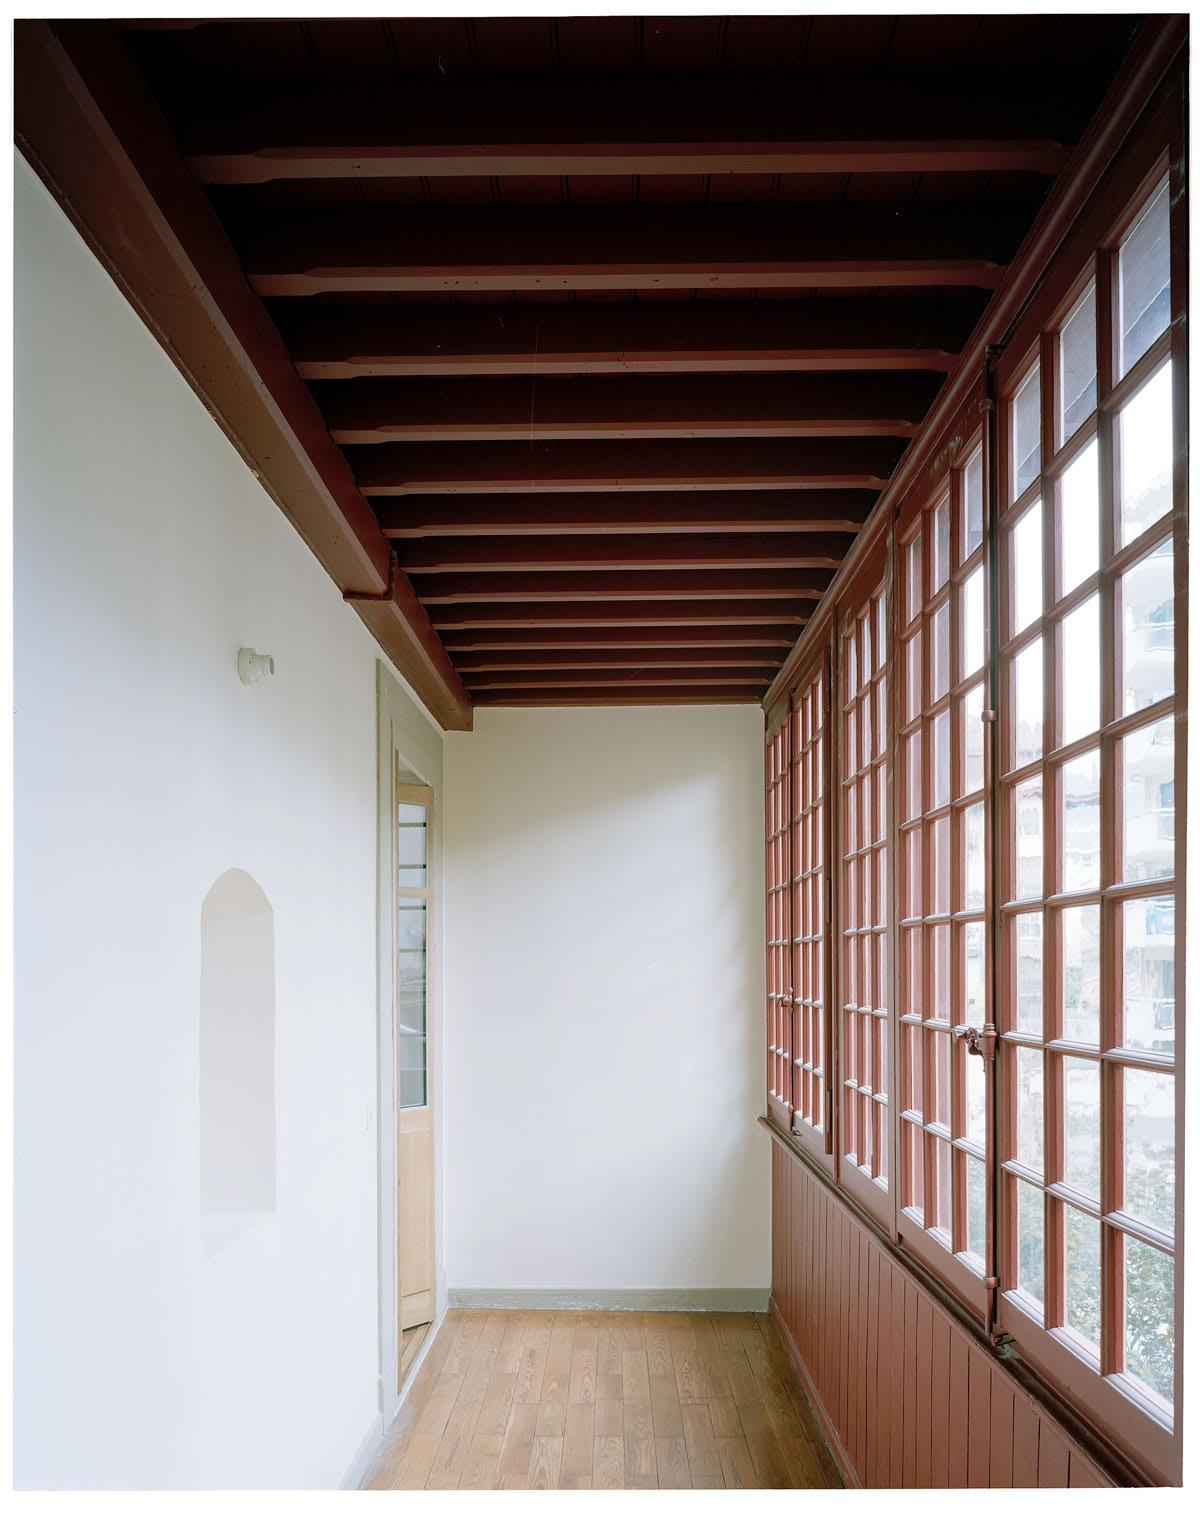 Rapin Saiz Architectes Joel Tettamanti Renovation Et Surelevation D Une Maison Locative Divisare